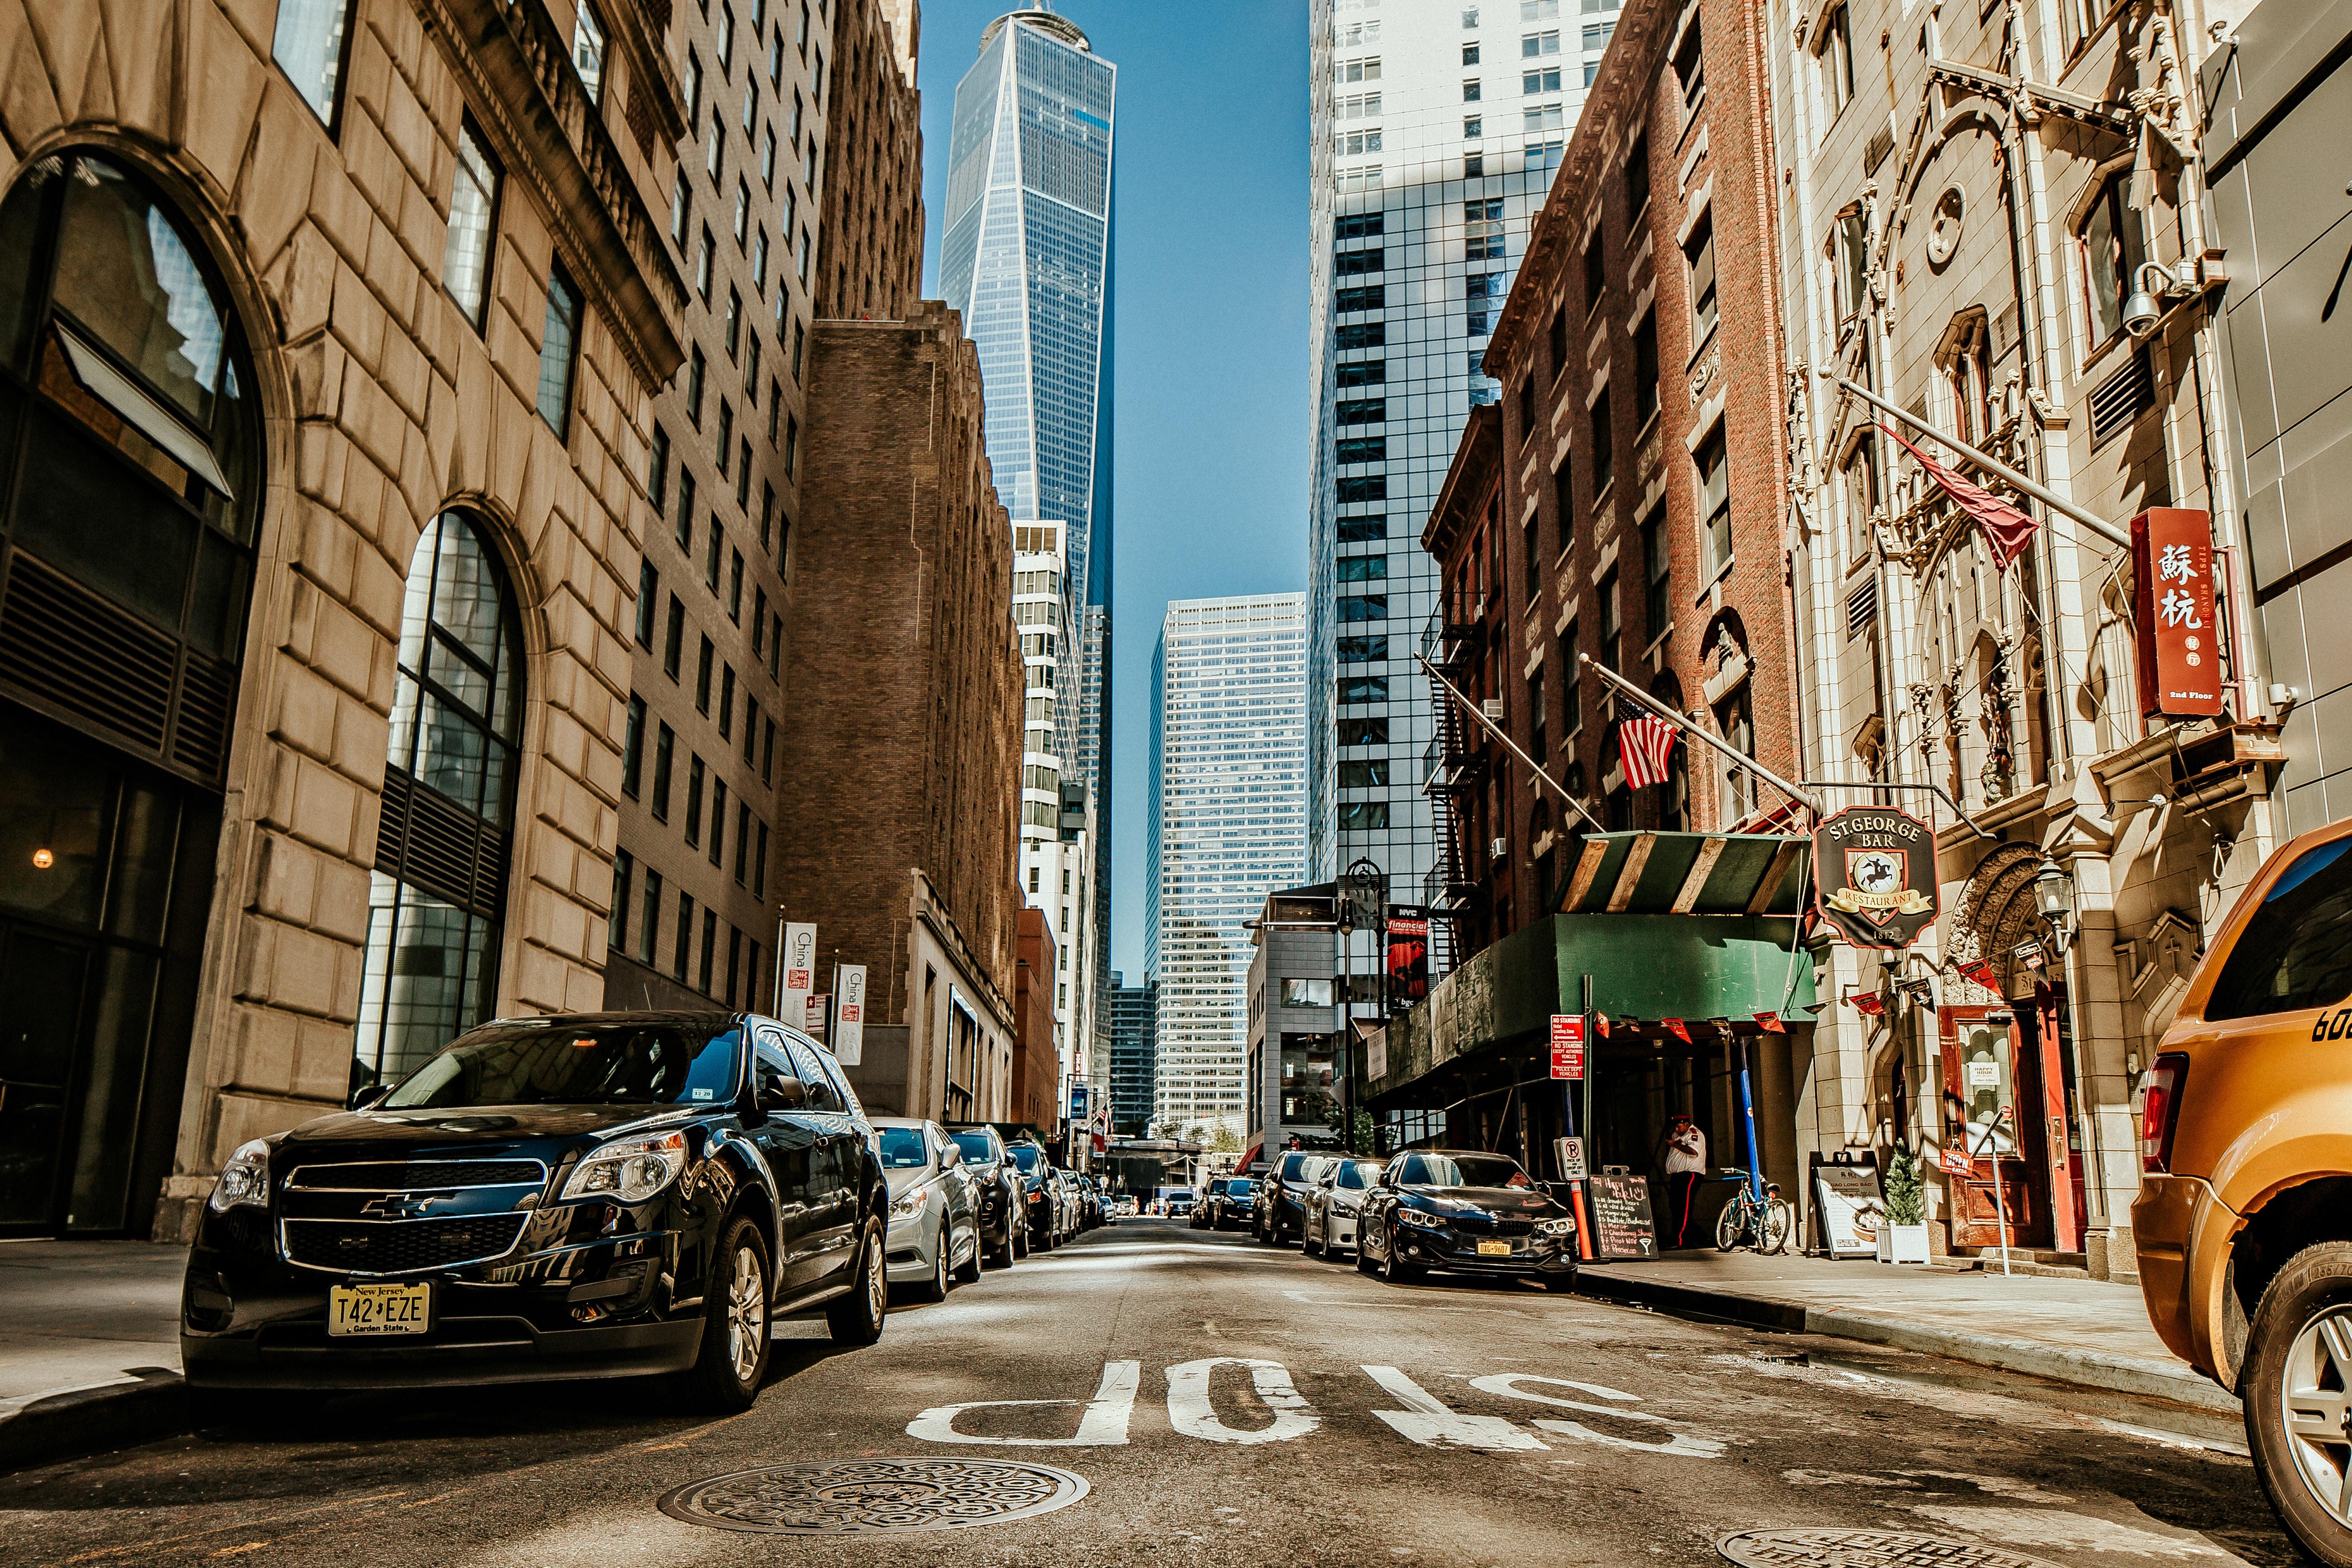 New York City Wallpaper 183 Pexels 183 Free Stock Photos